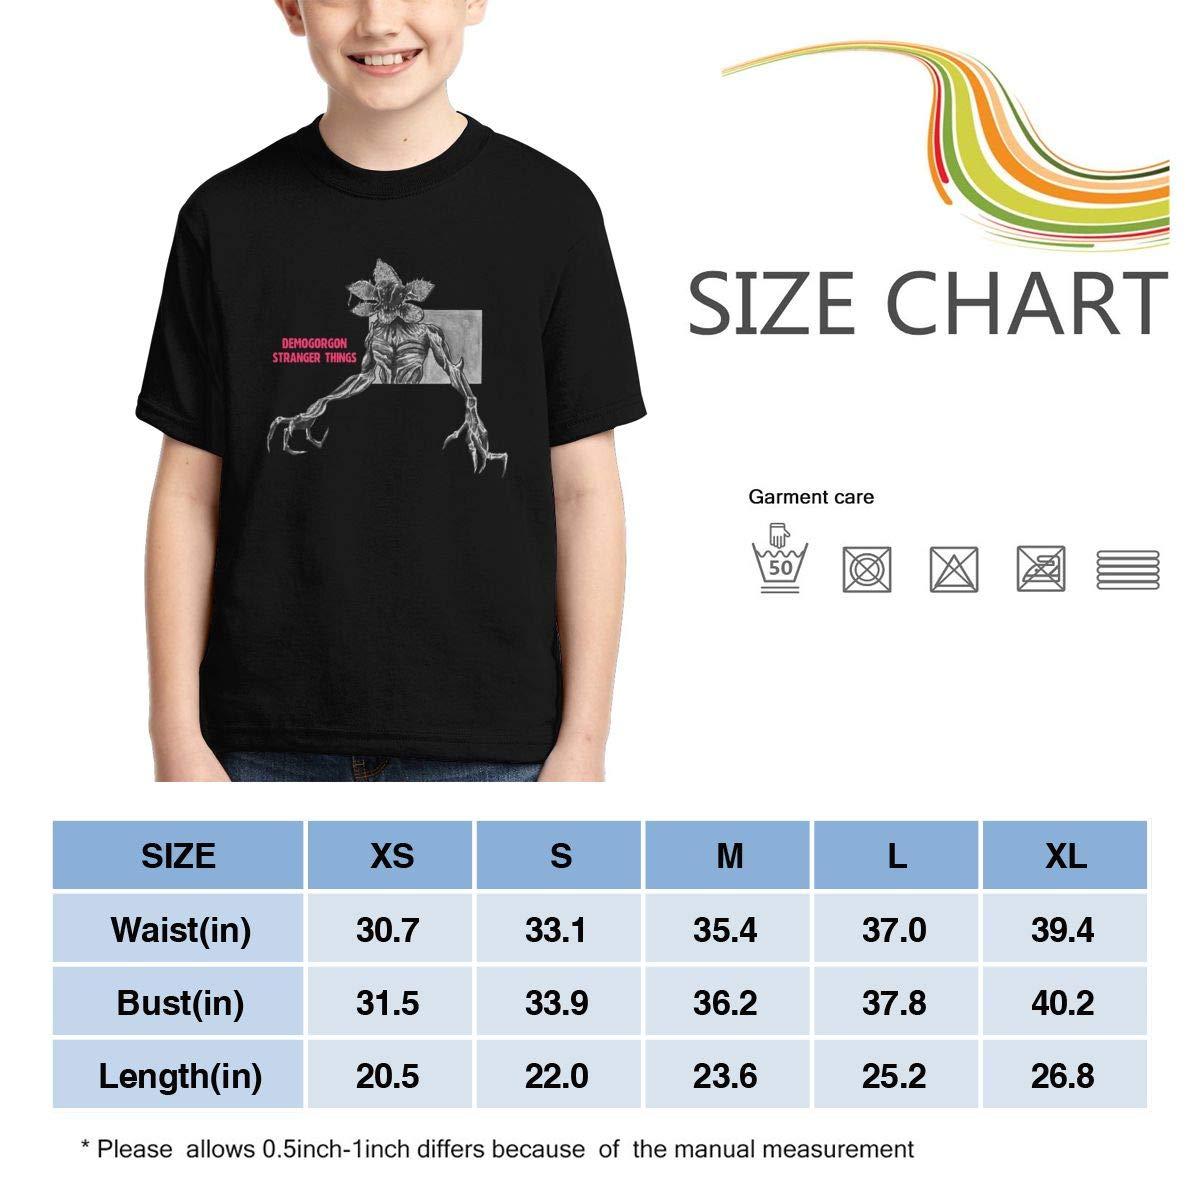 Demogorgon Stranger Kids Things Fan Tee for Boy Girl Black Magicuas Kid T Shirt